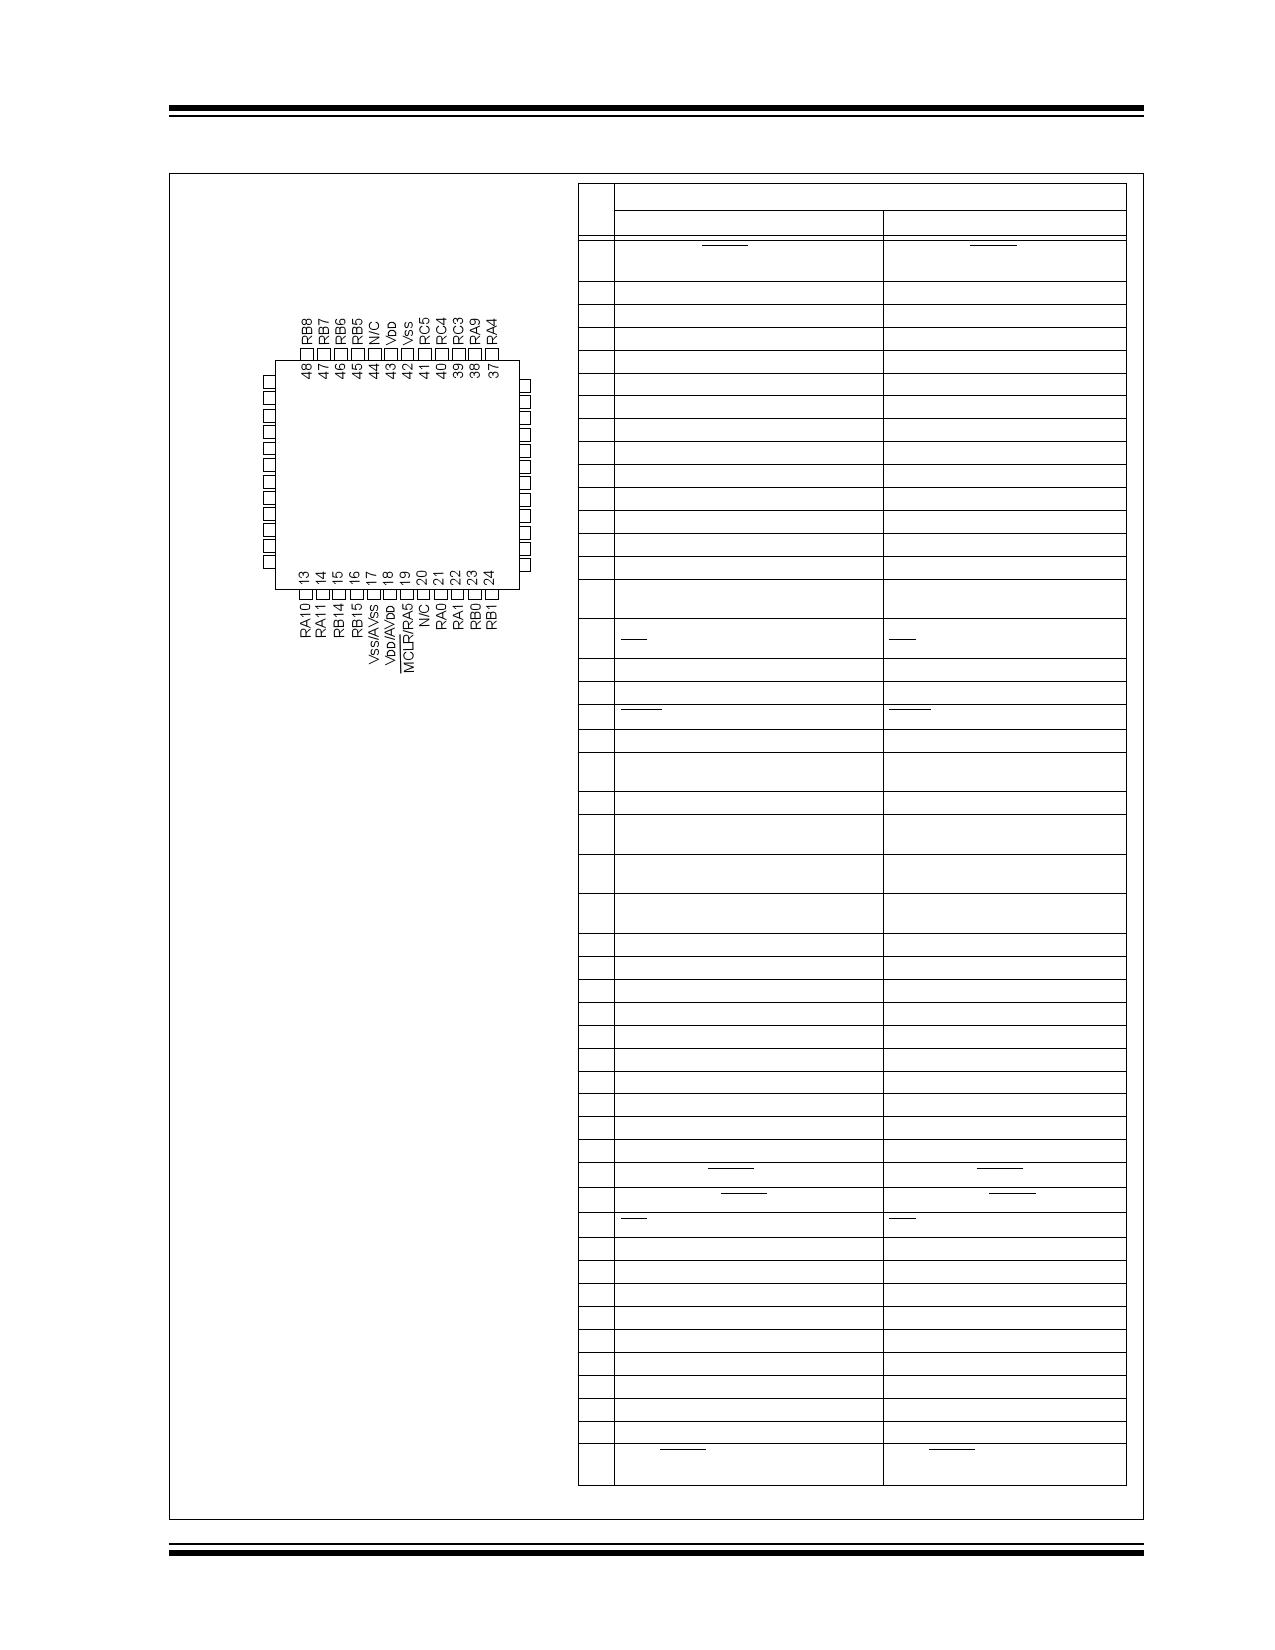 PIC24F16KA301 전자부품, 판매, 대치품